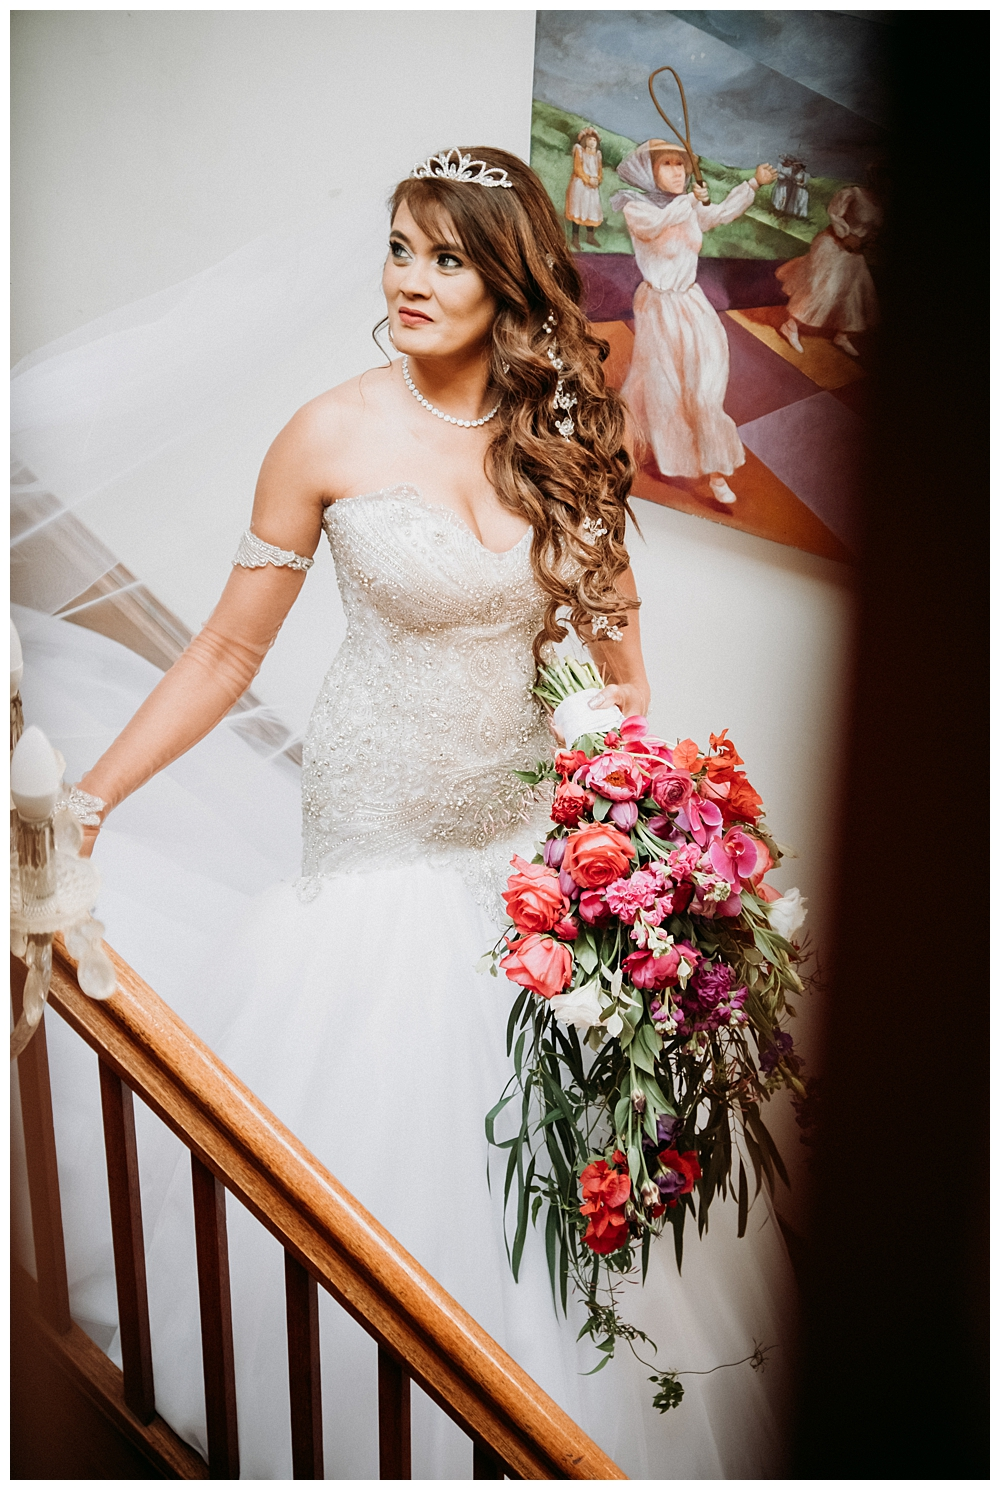 Best_Wedding_Photographer_AlexanderSmith_1791.jpg